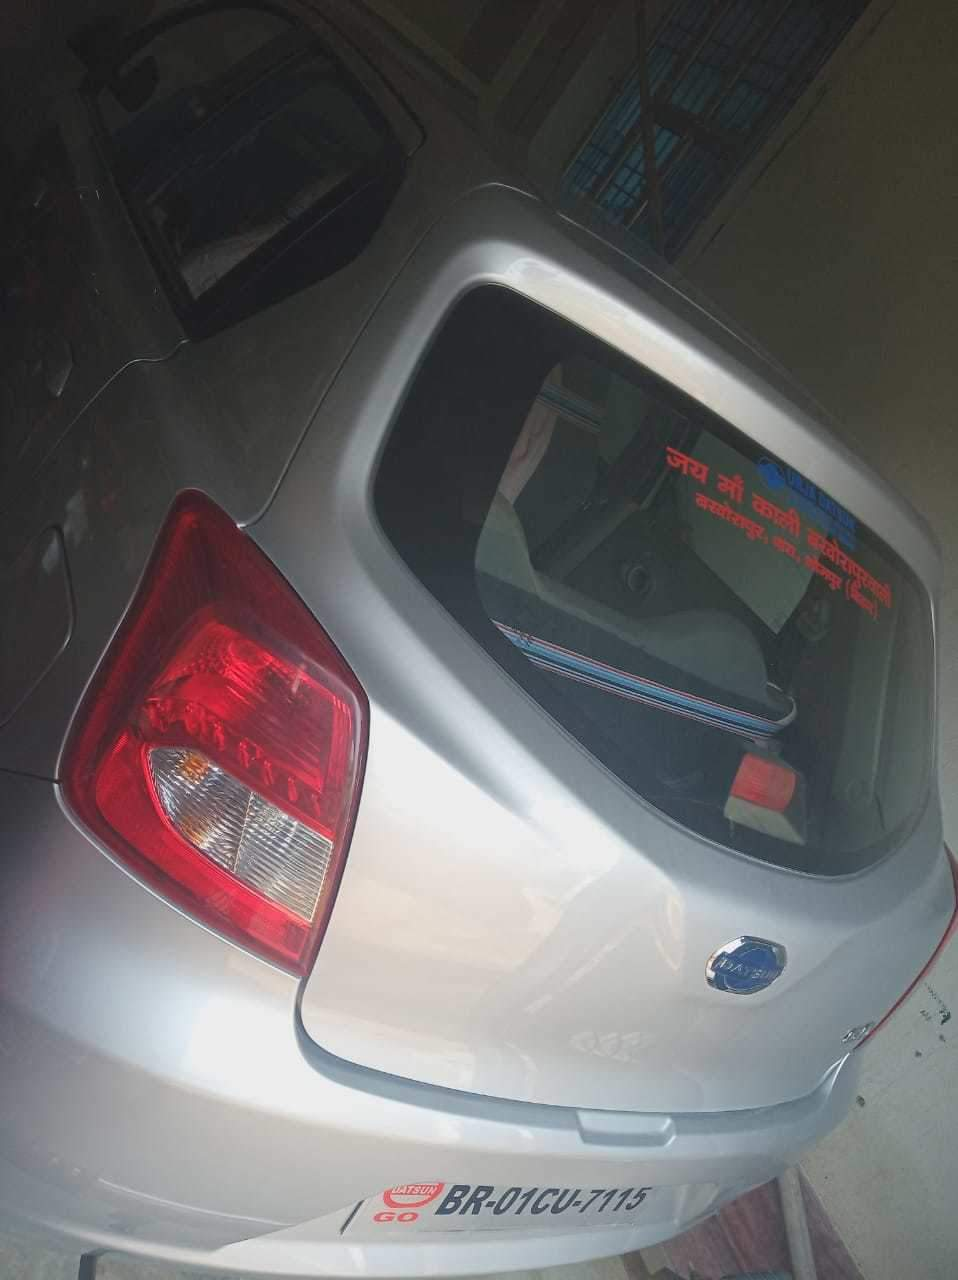 Datsun Go Front Left Rim